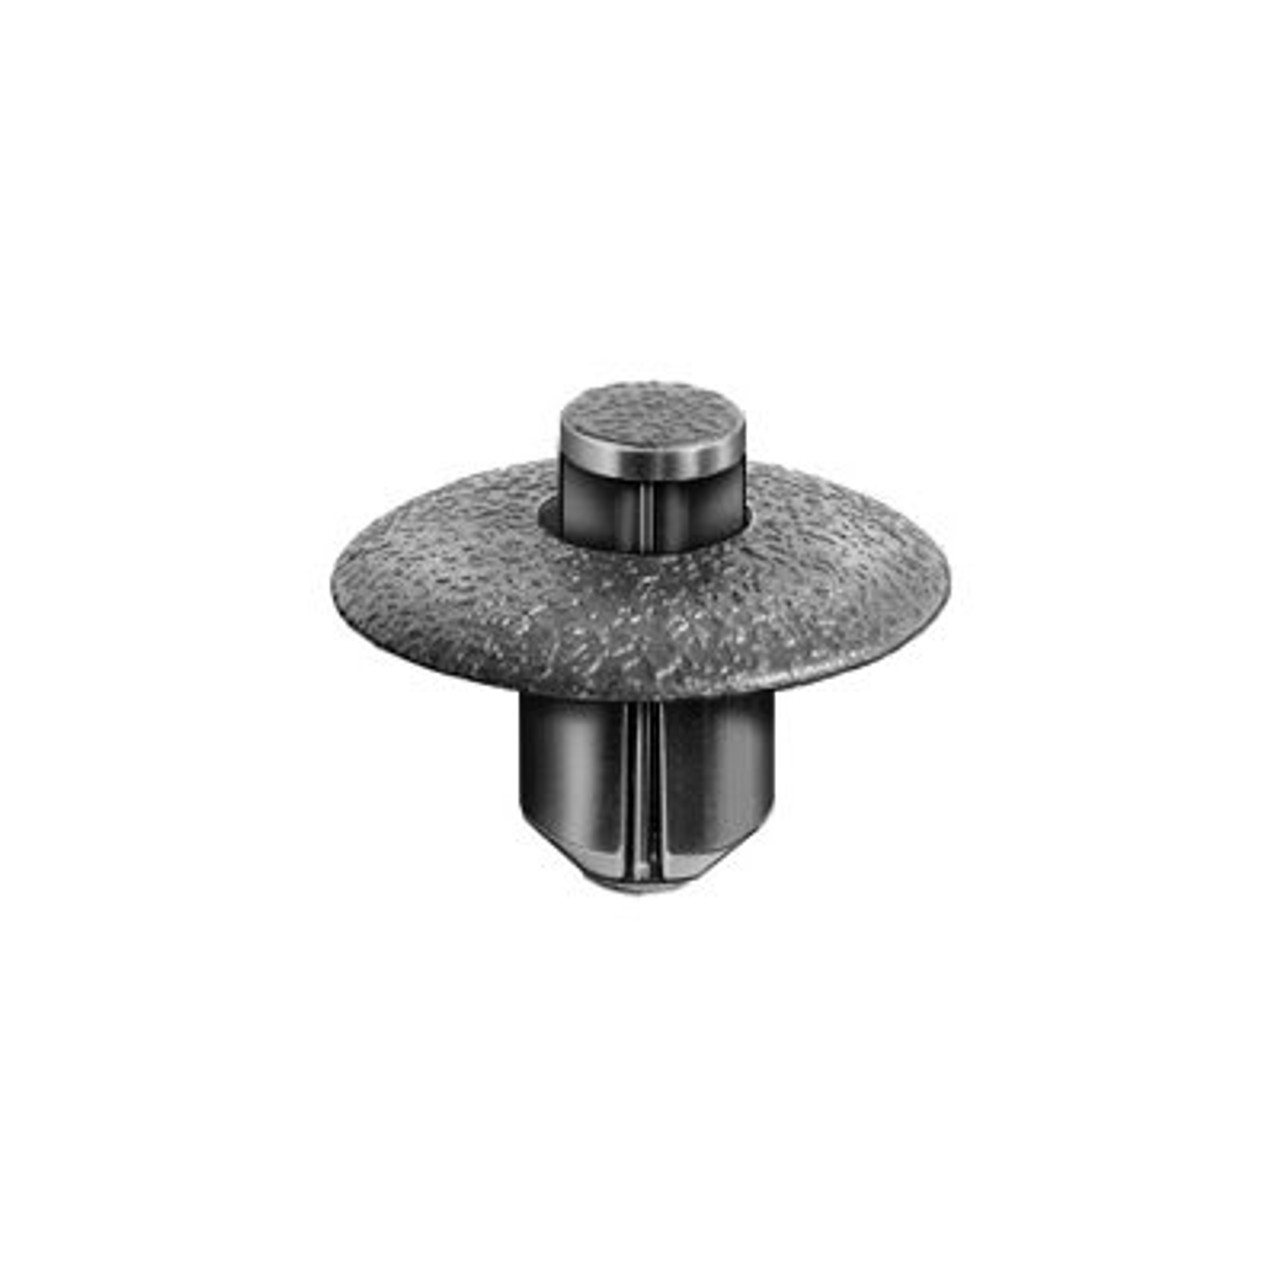 Description : Push-Type Retainer Type : Push-Type with Drive Pin Head Diameter : 17MM Stem Length : 9MM Hole Size : 7MM Color : Black Lexus OEM: 90467-07117 Pcs/Unit: 10 Per Box Country: CN Catalog Page #: 504